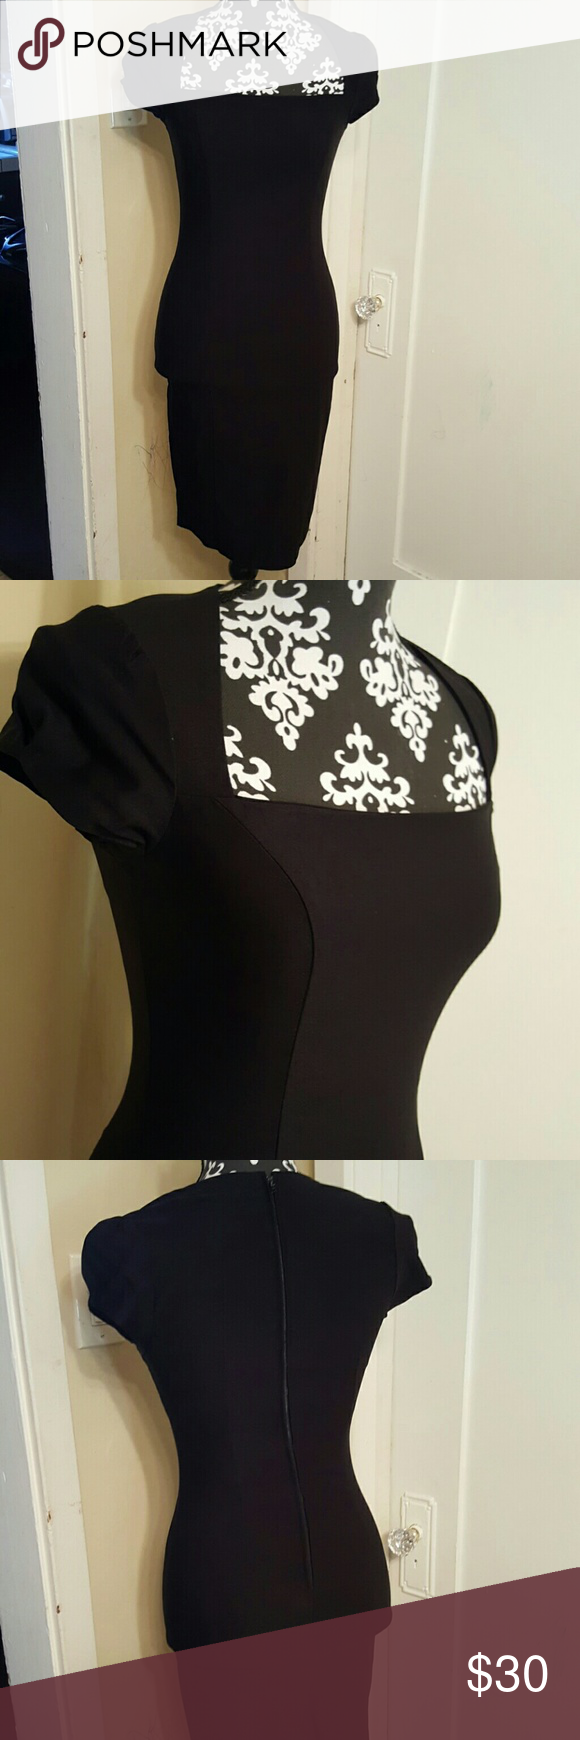 Super cute tight black dress tight black dresses asos dress and asos